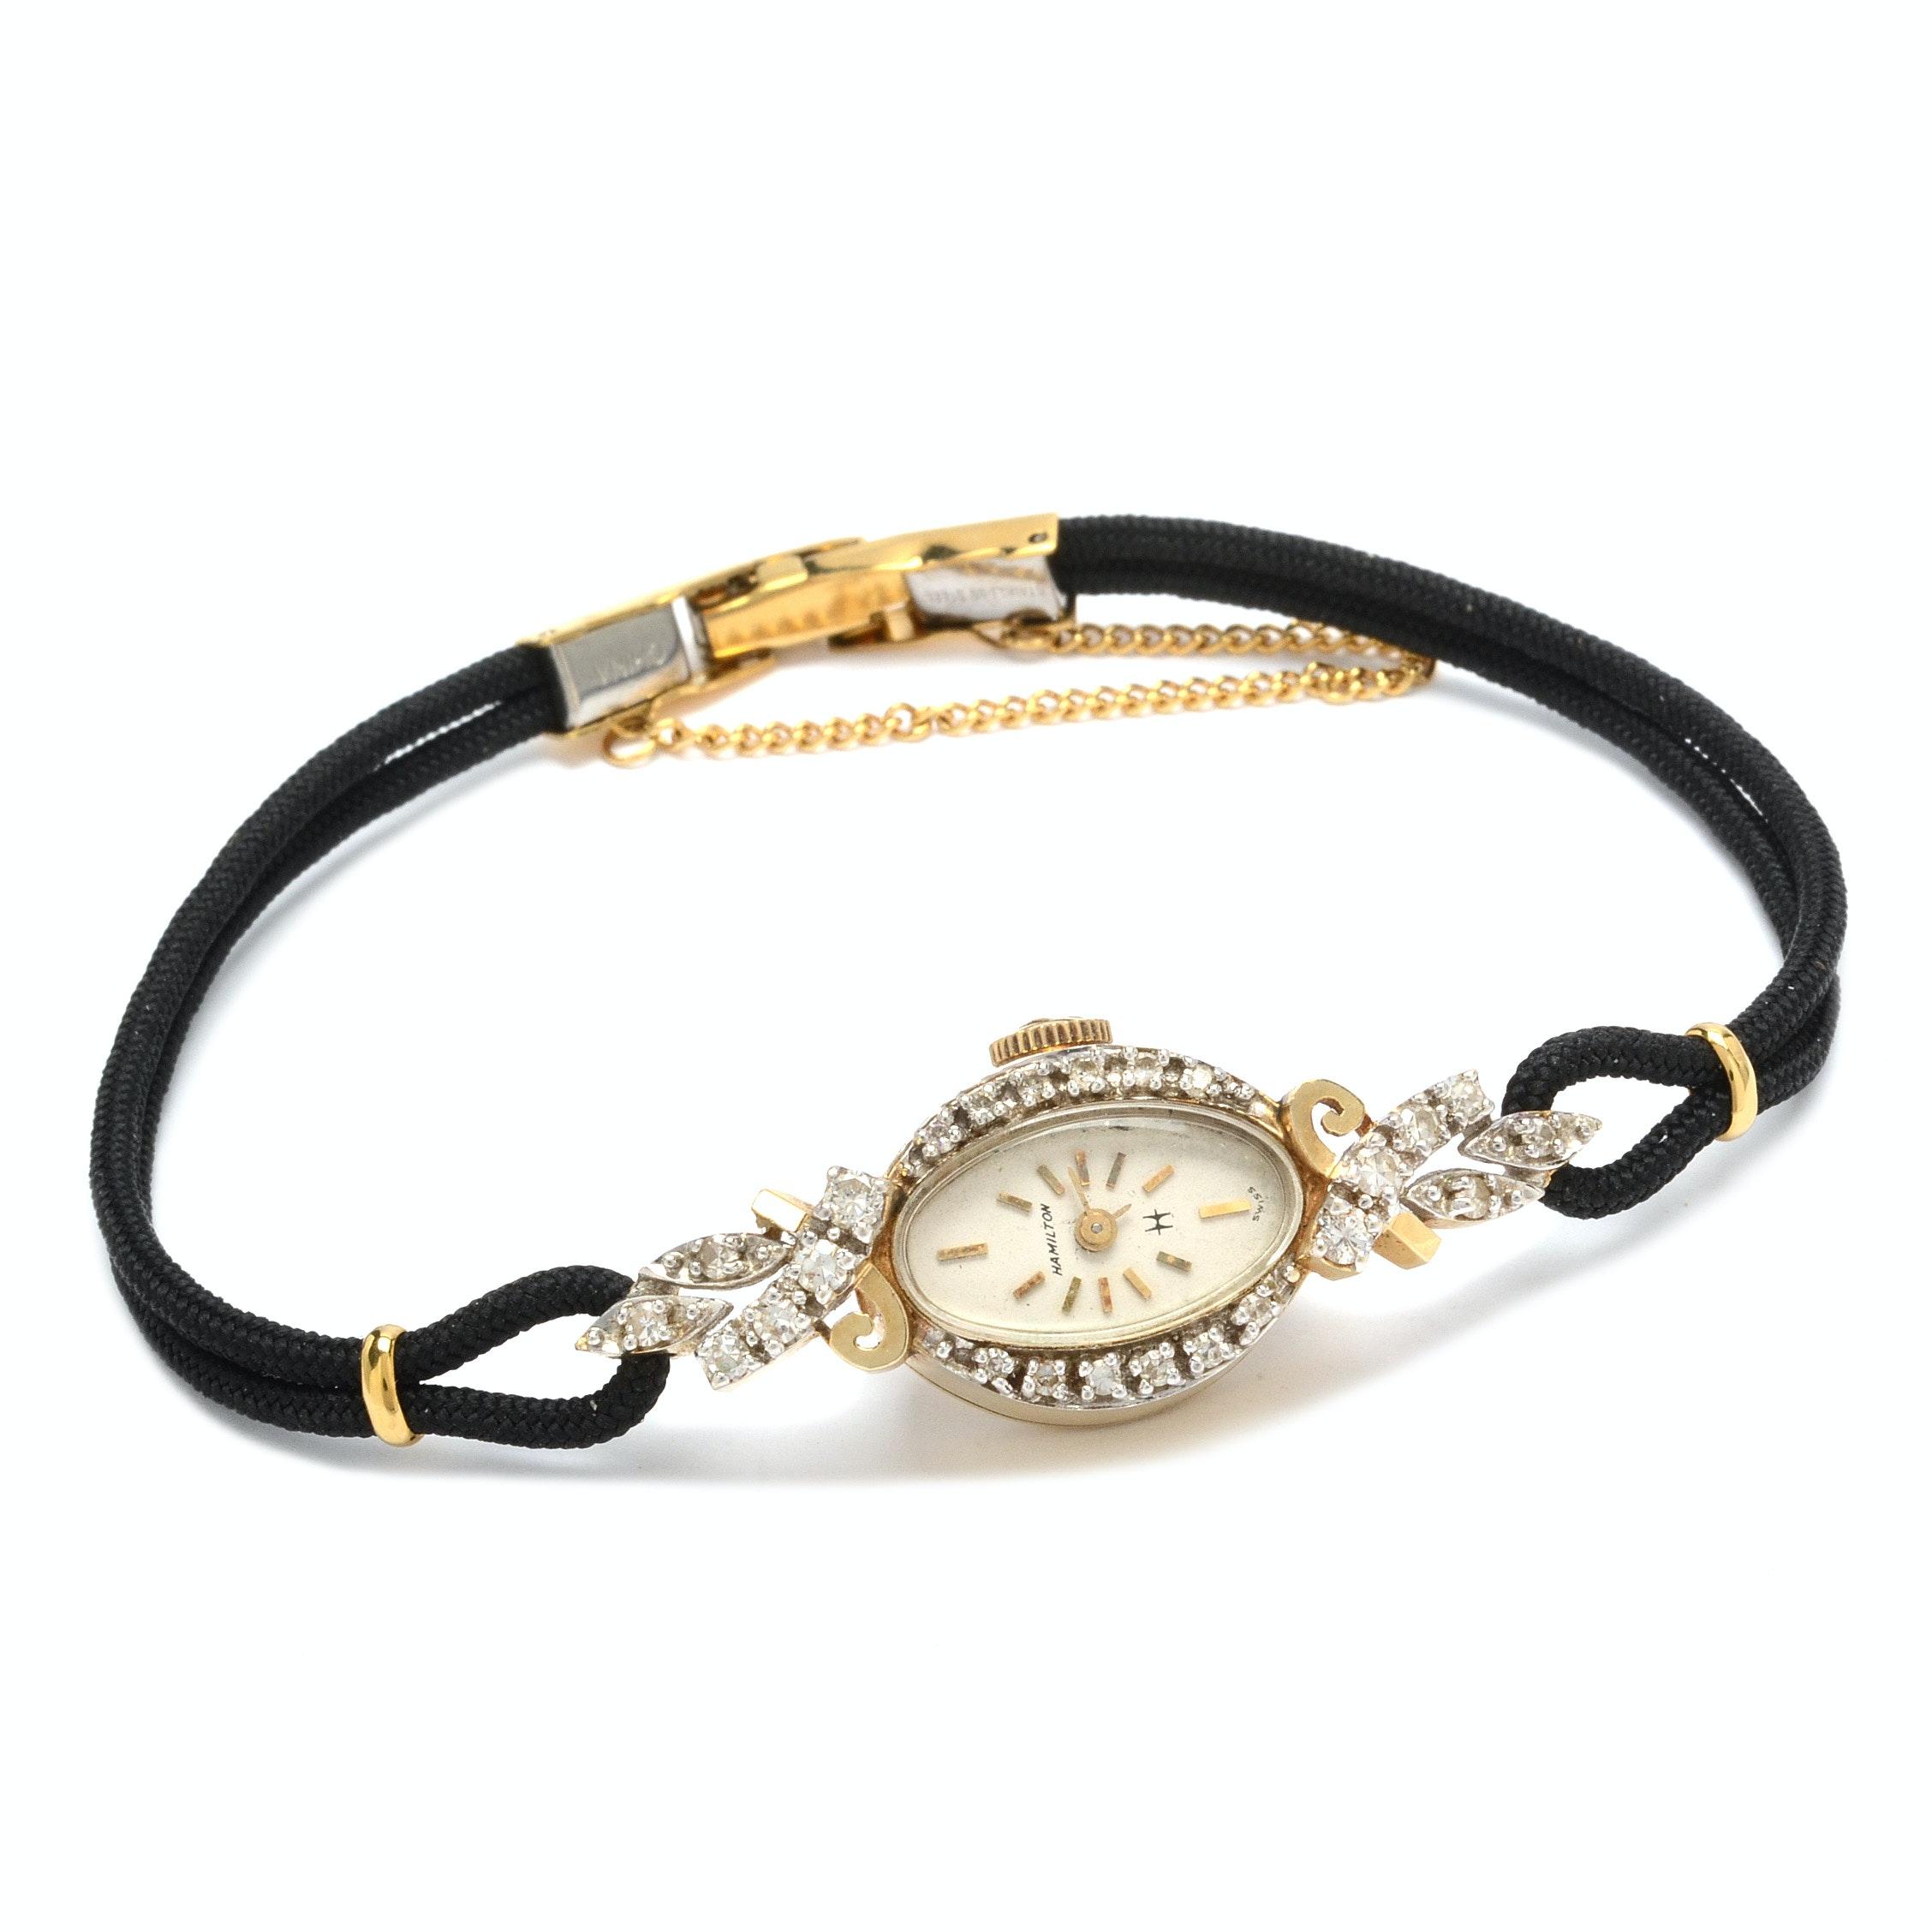 14K Yellow Gold and Diamond Hamilton Wristwatch